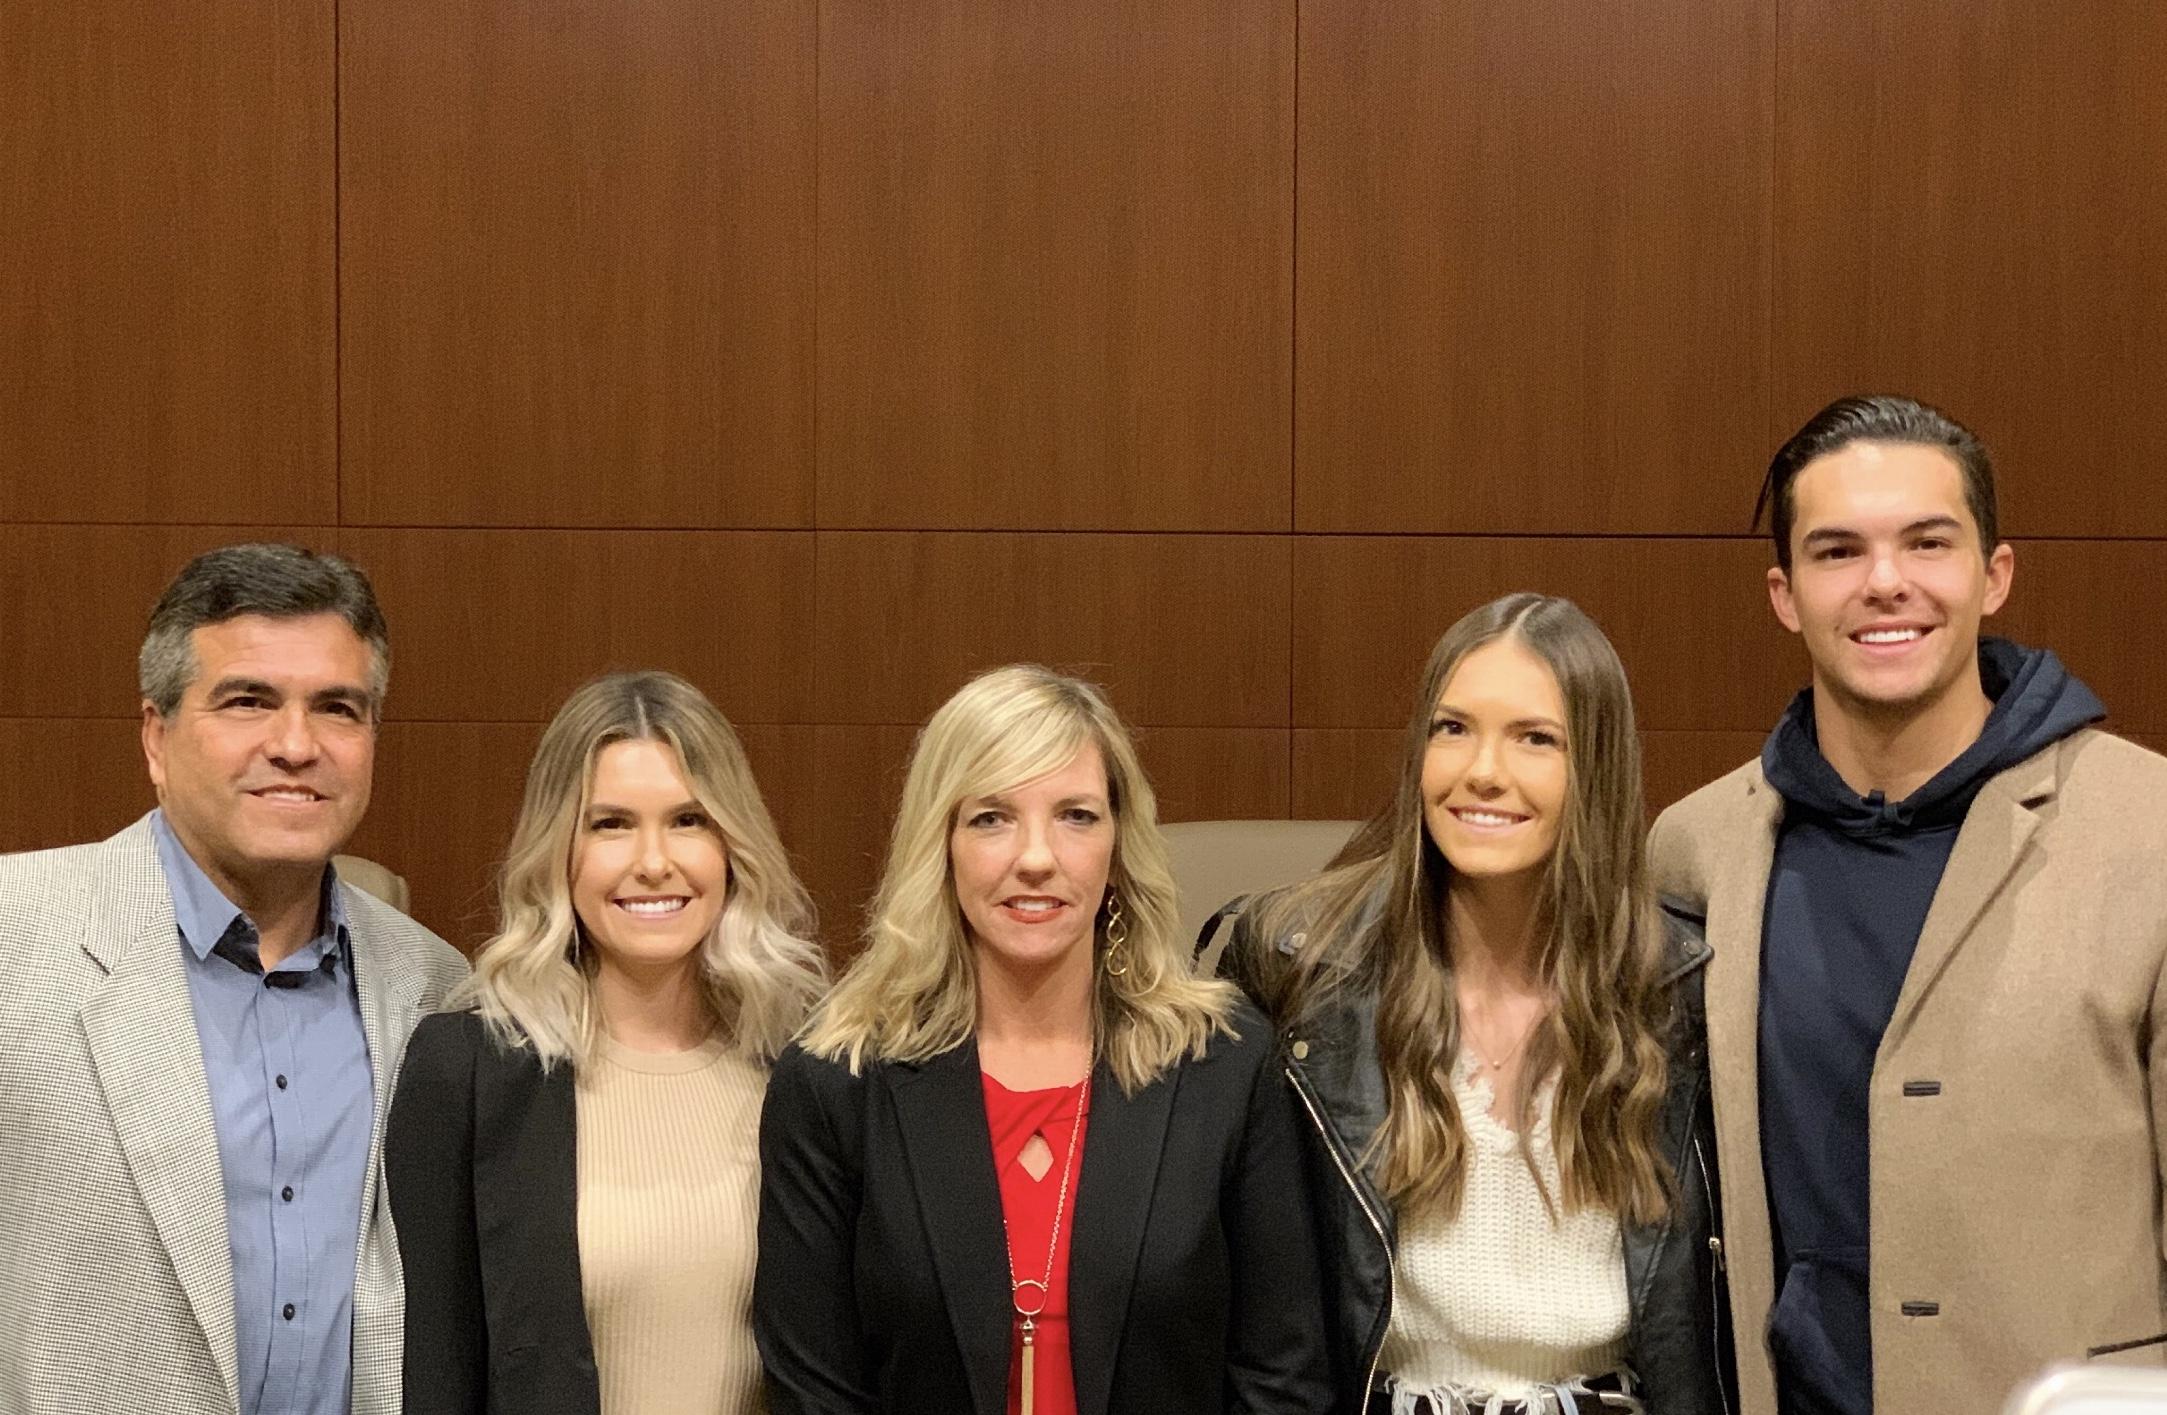 Anne with her husband Dan, and 3 children, Amanda, Caroline, and Patrick.